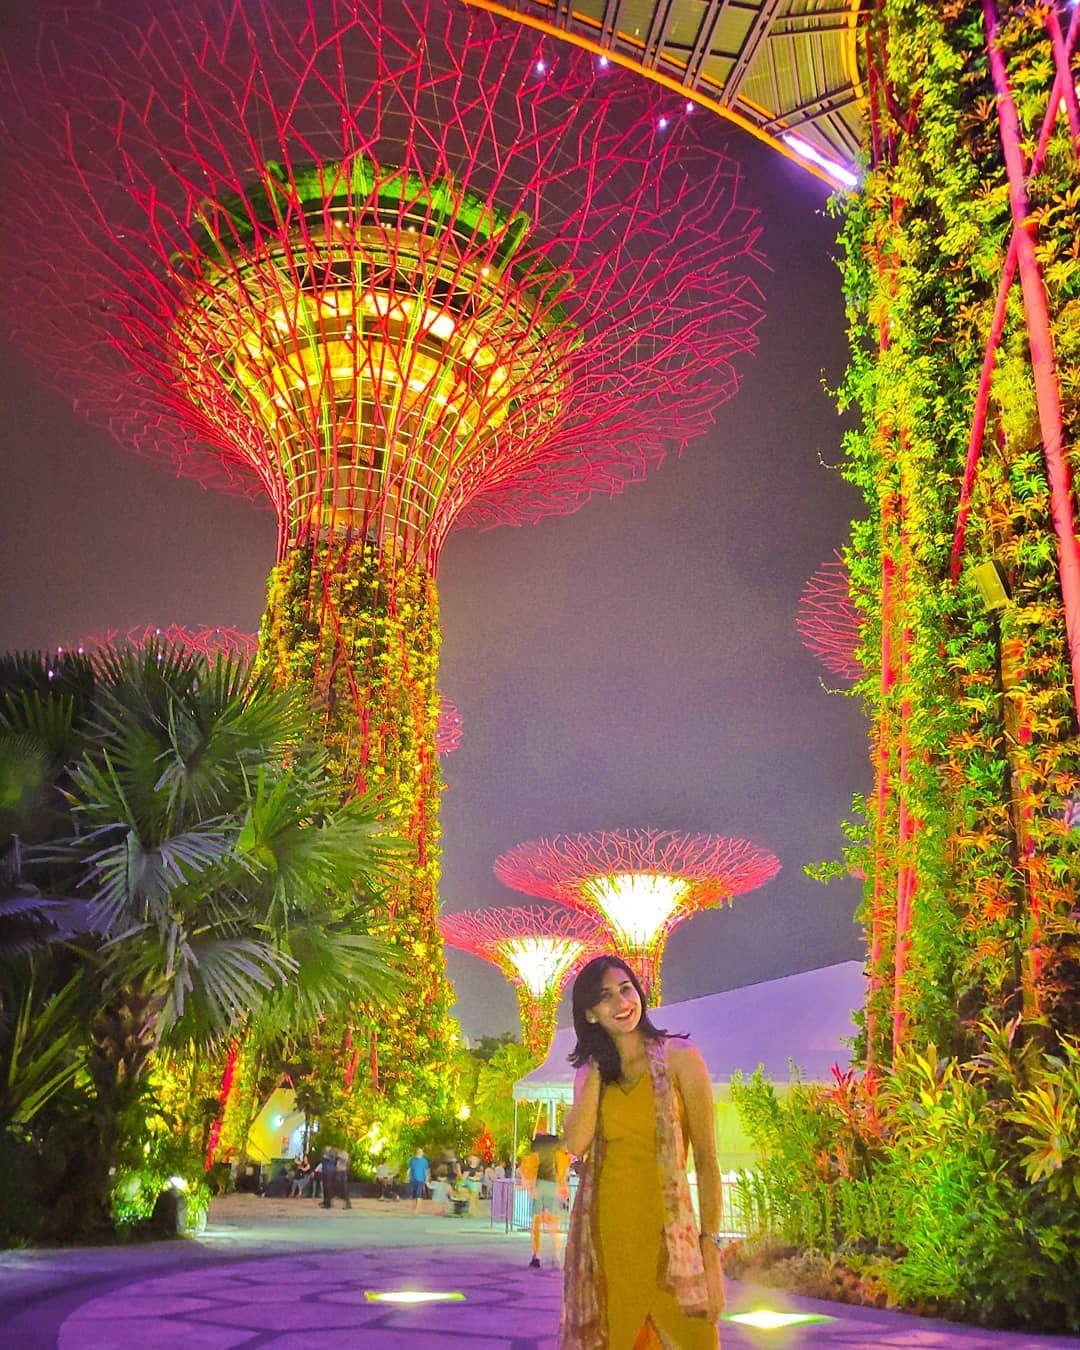 229057b03b7988b2c4642eb1aefc81f1 - Gardens By The Bay Timings Light Show